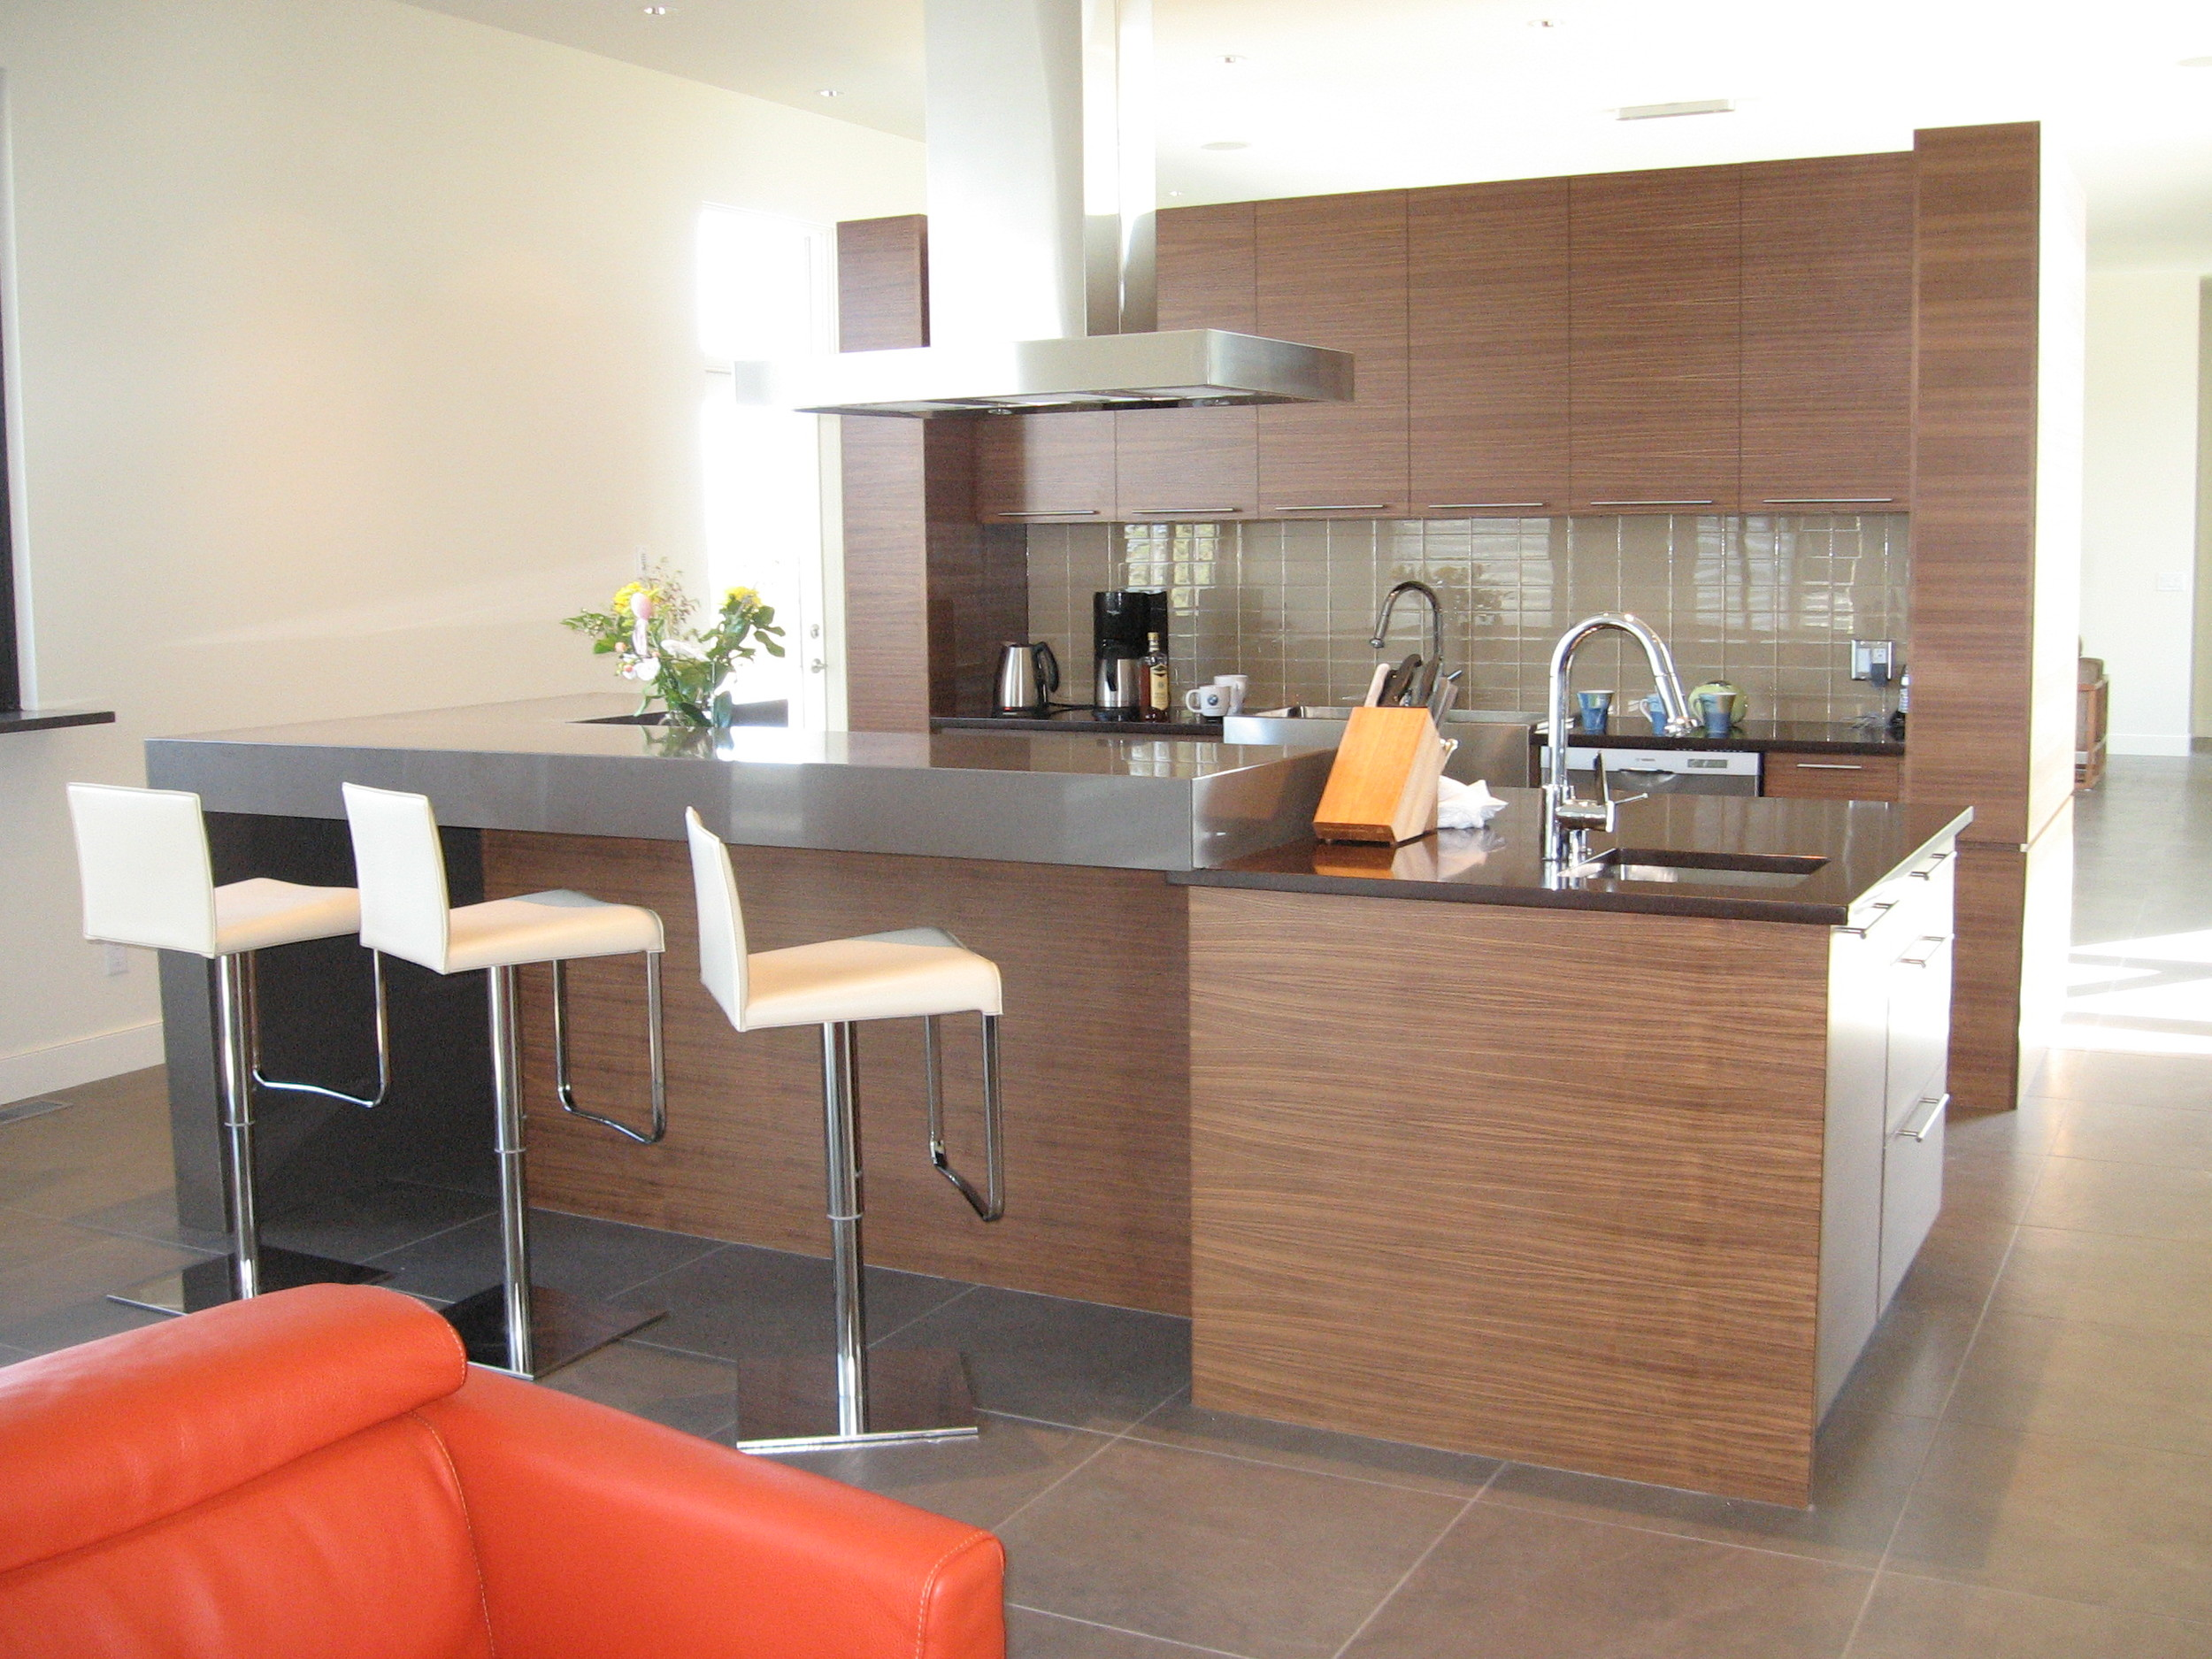 walnut-wood-custom-kitchen-cabinetry-island.JPG